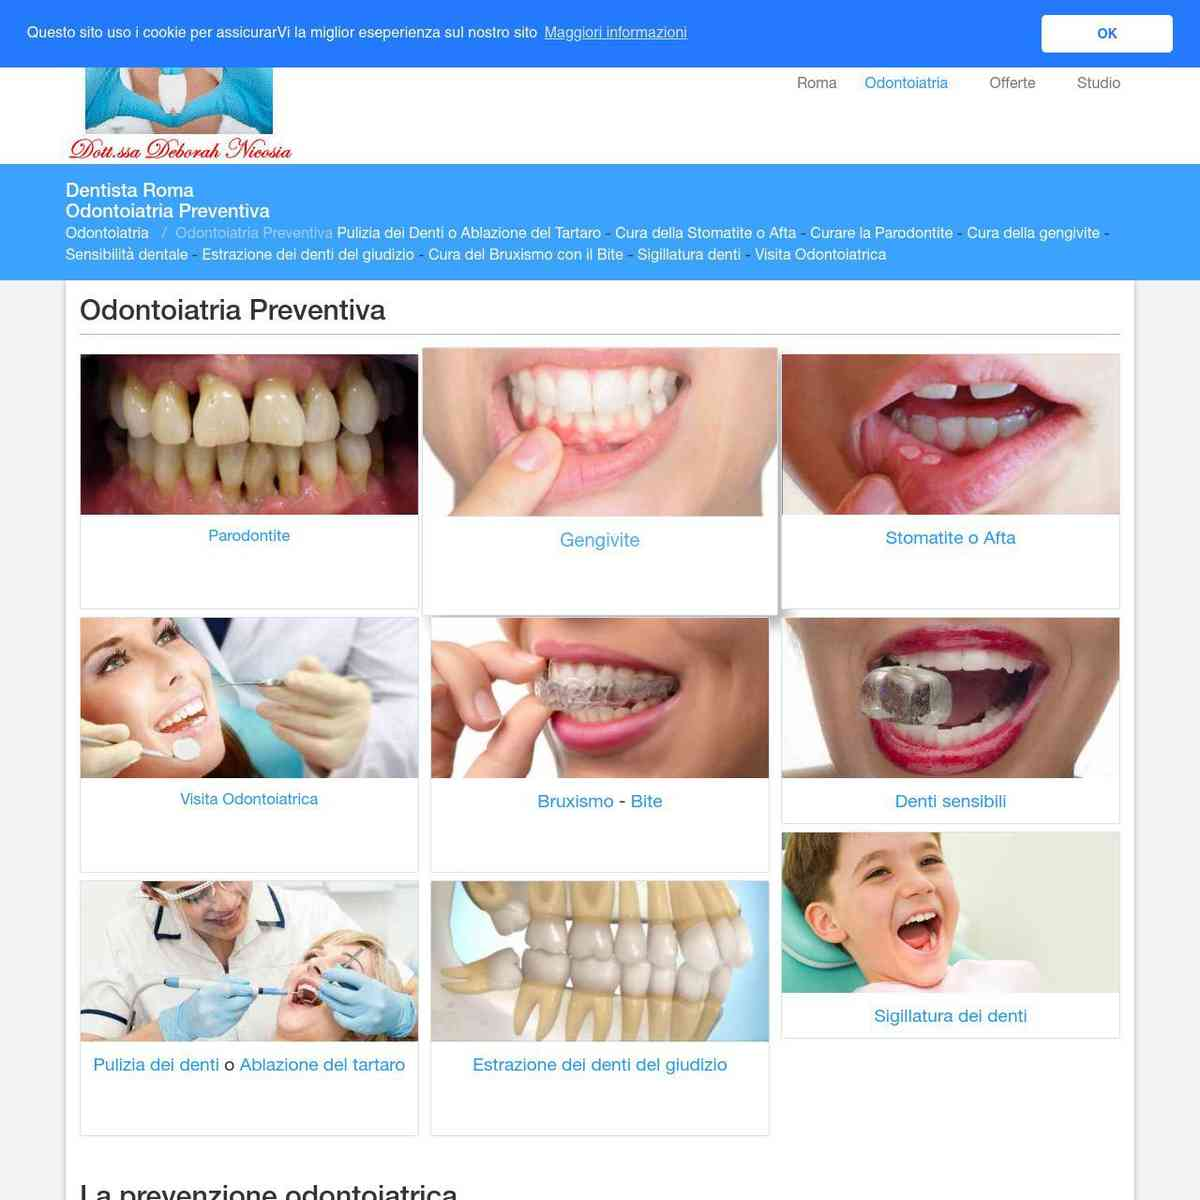 Odontoiatria Preventiva - Dentista Roma